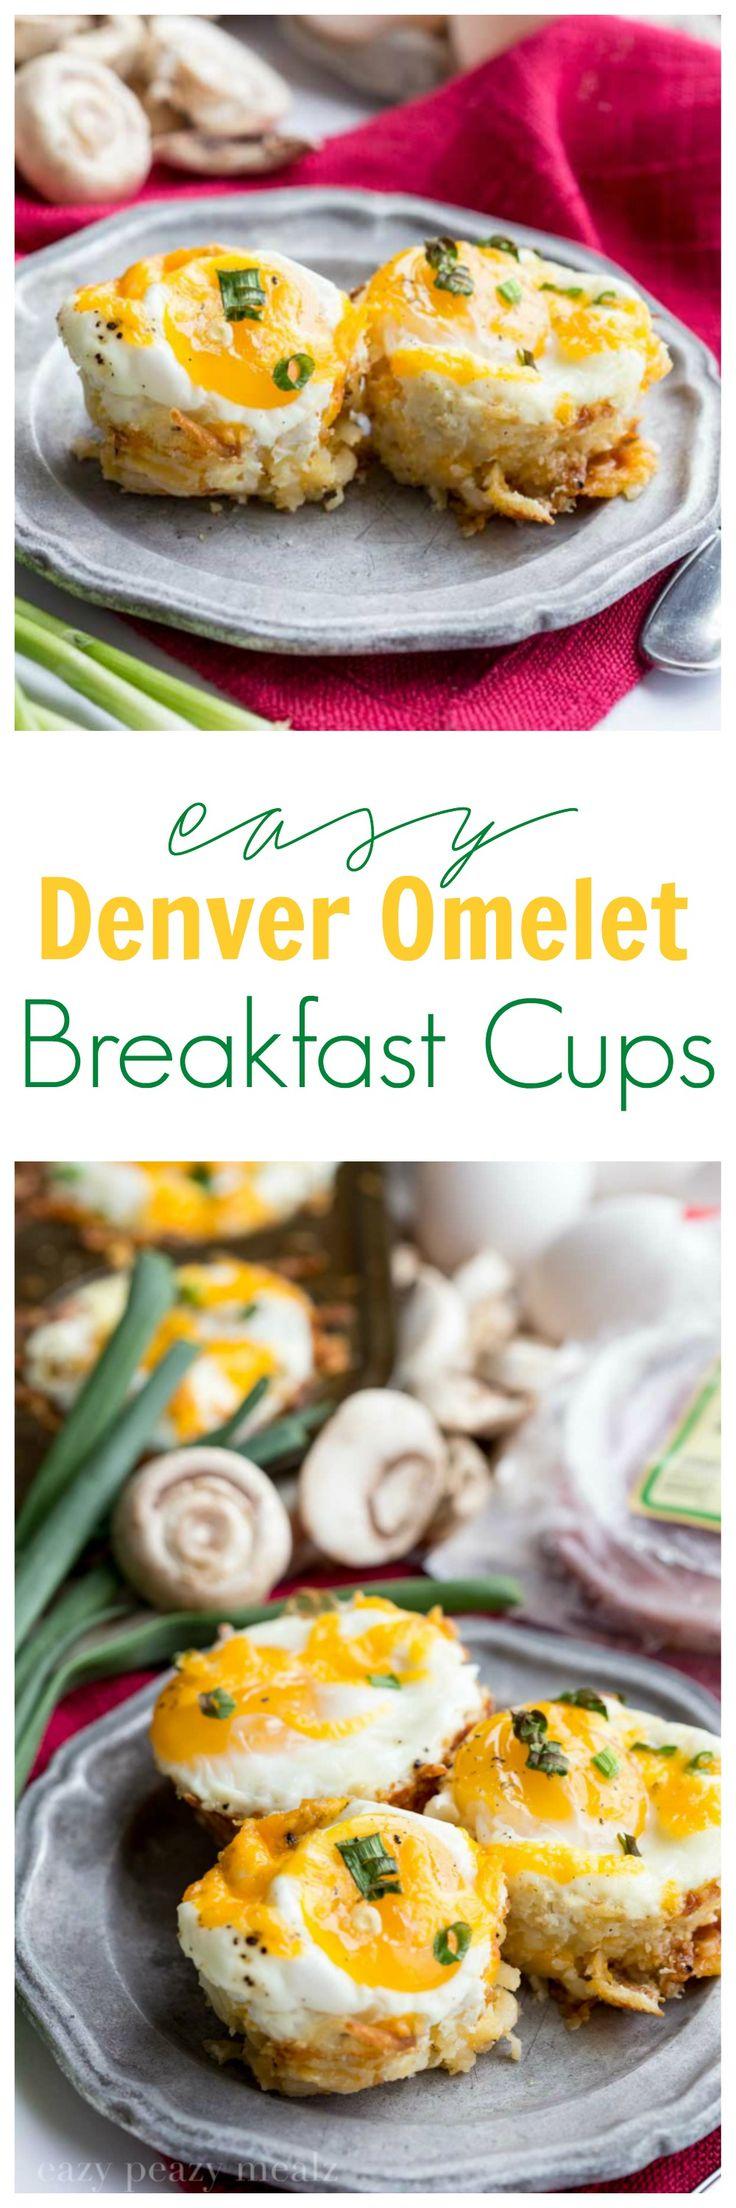 Easy Denver Omelet Breakfast Cups are your breakfast solution. #ad #JonesBrinner - Eazy Peazy Mealz: